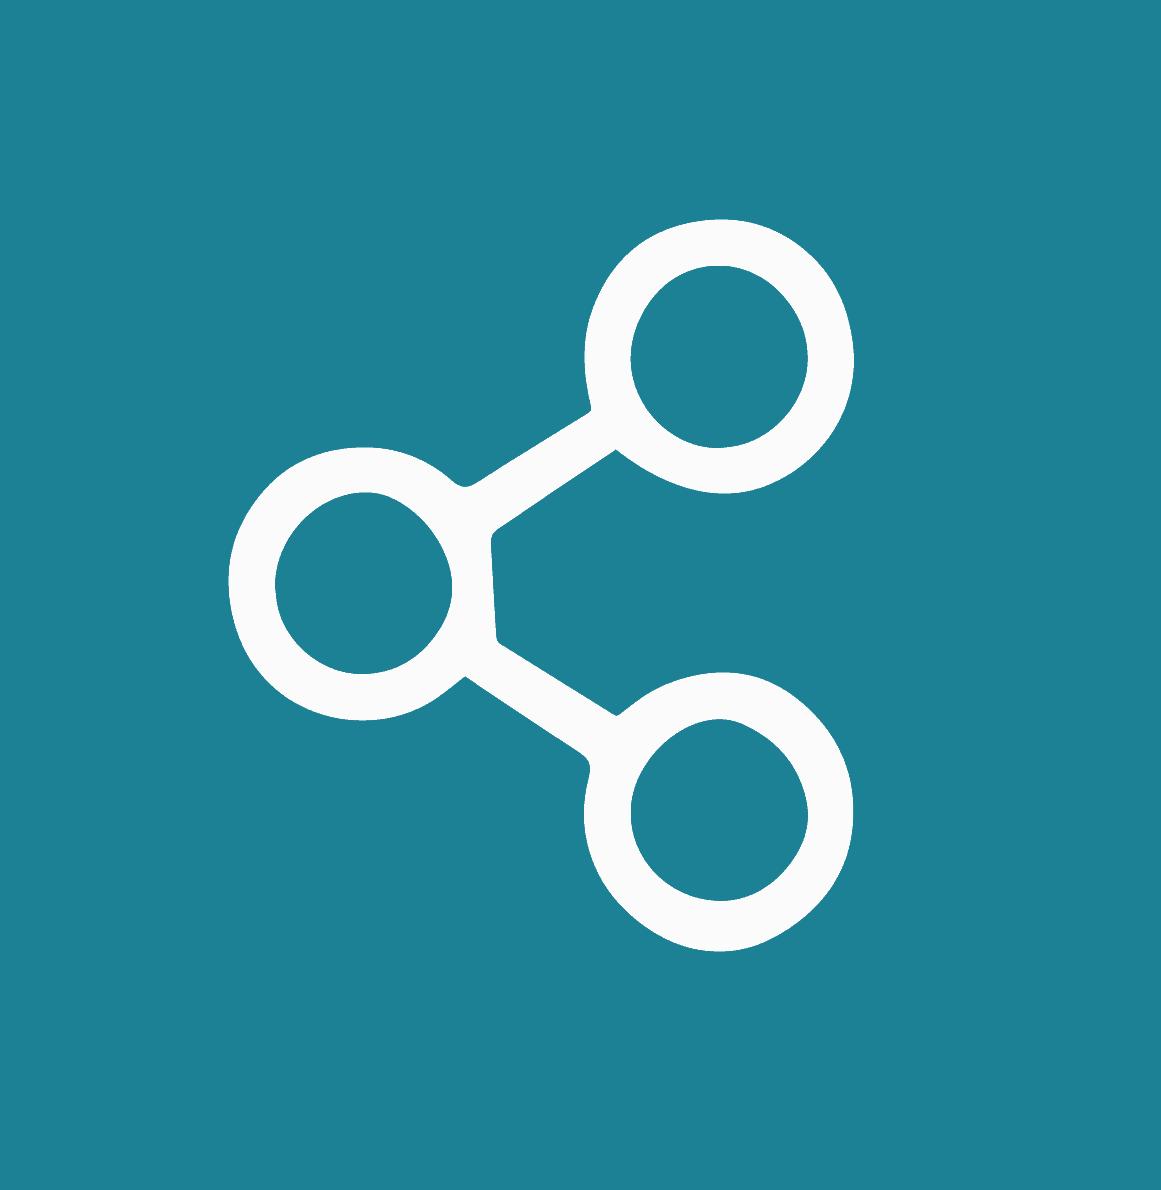 government workflow management versatility icon